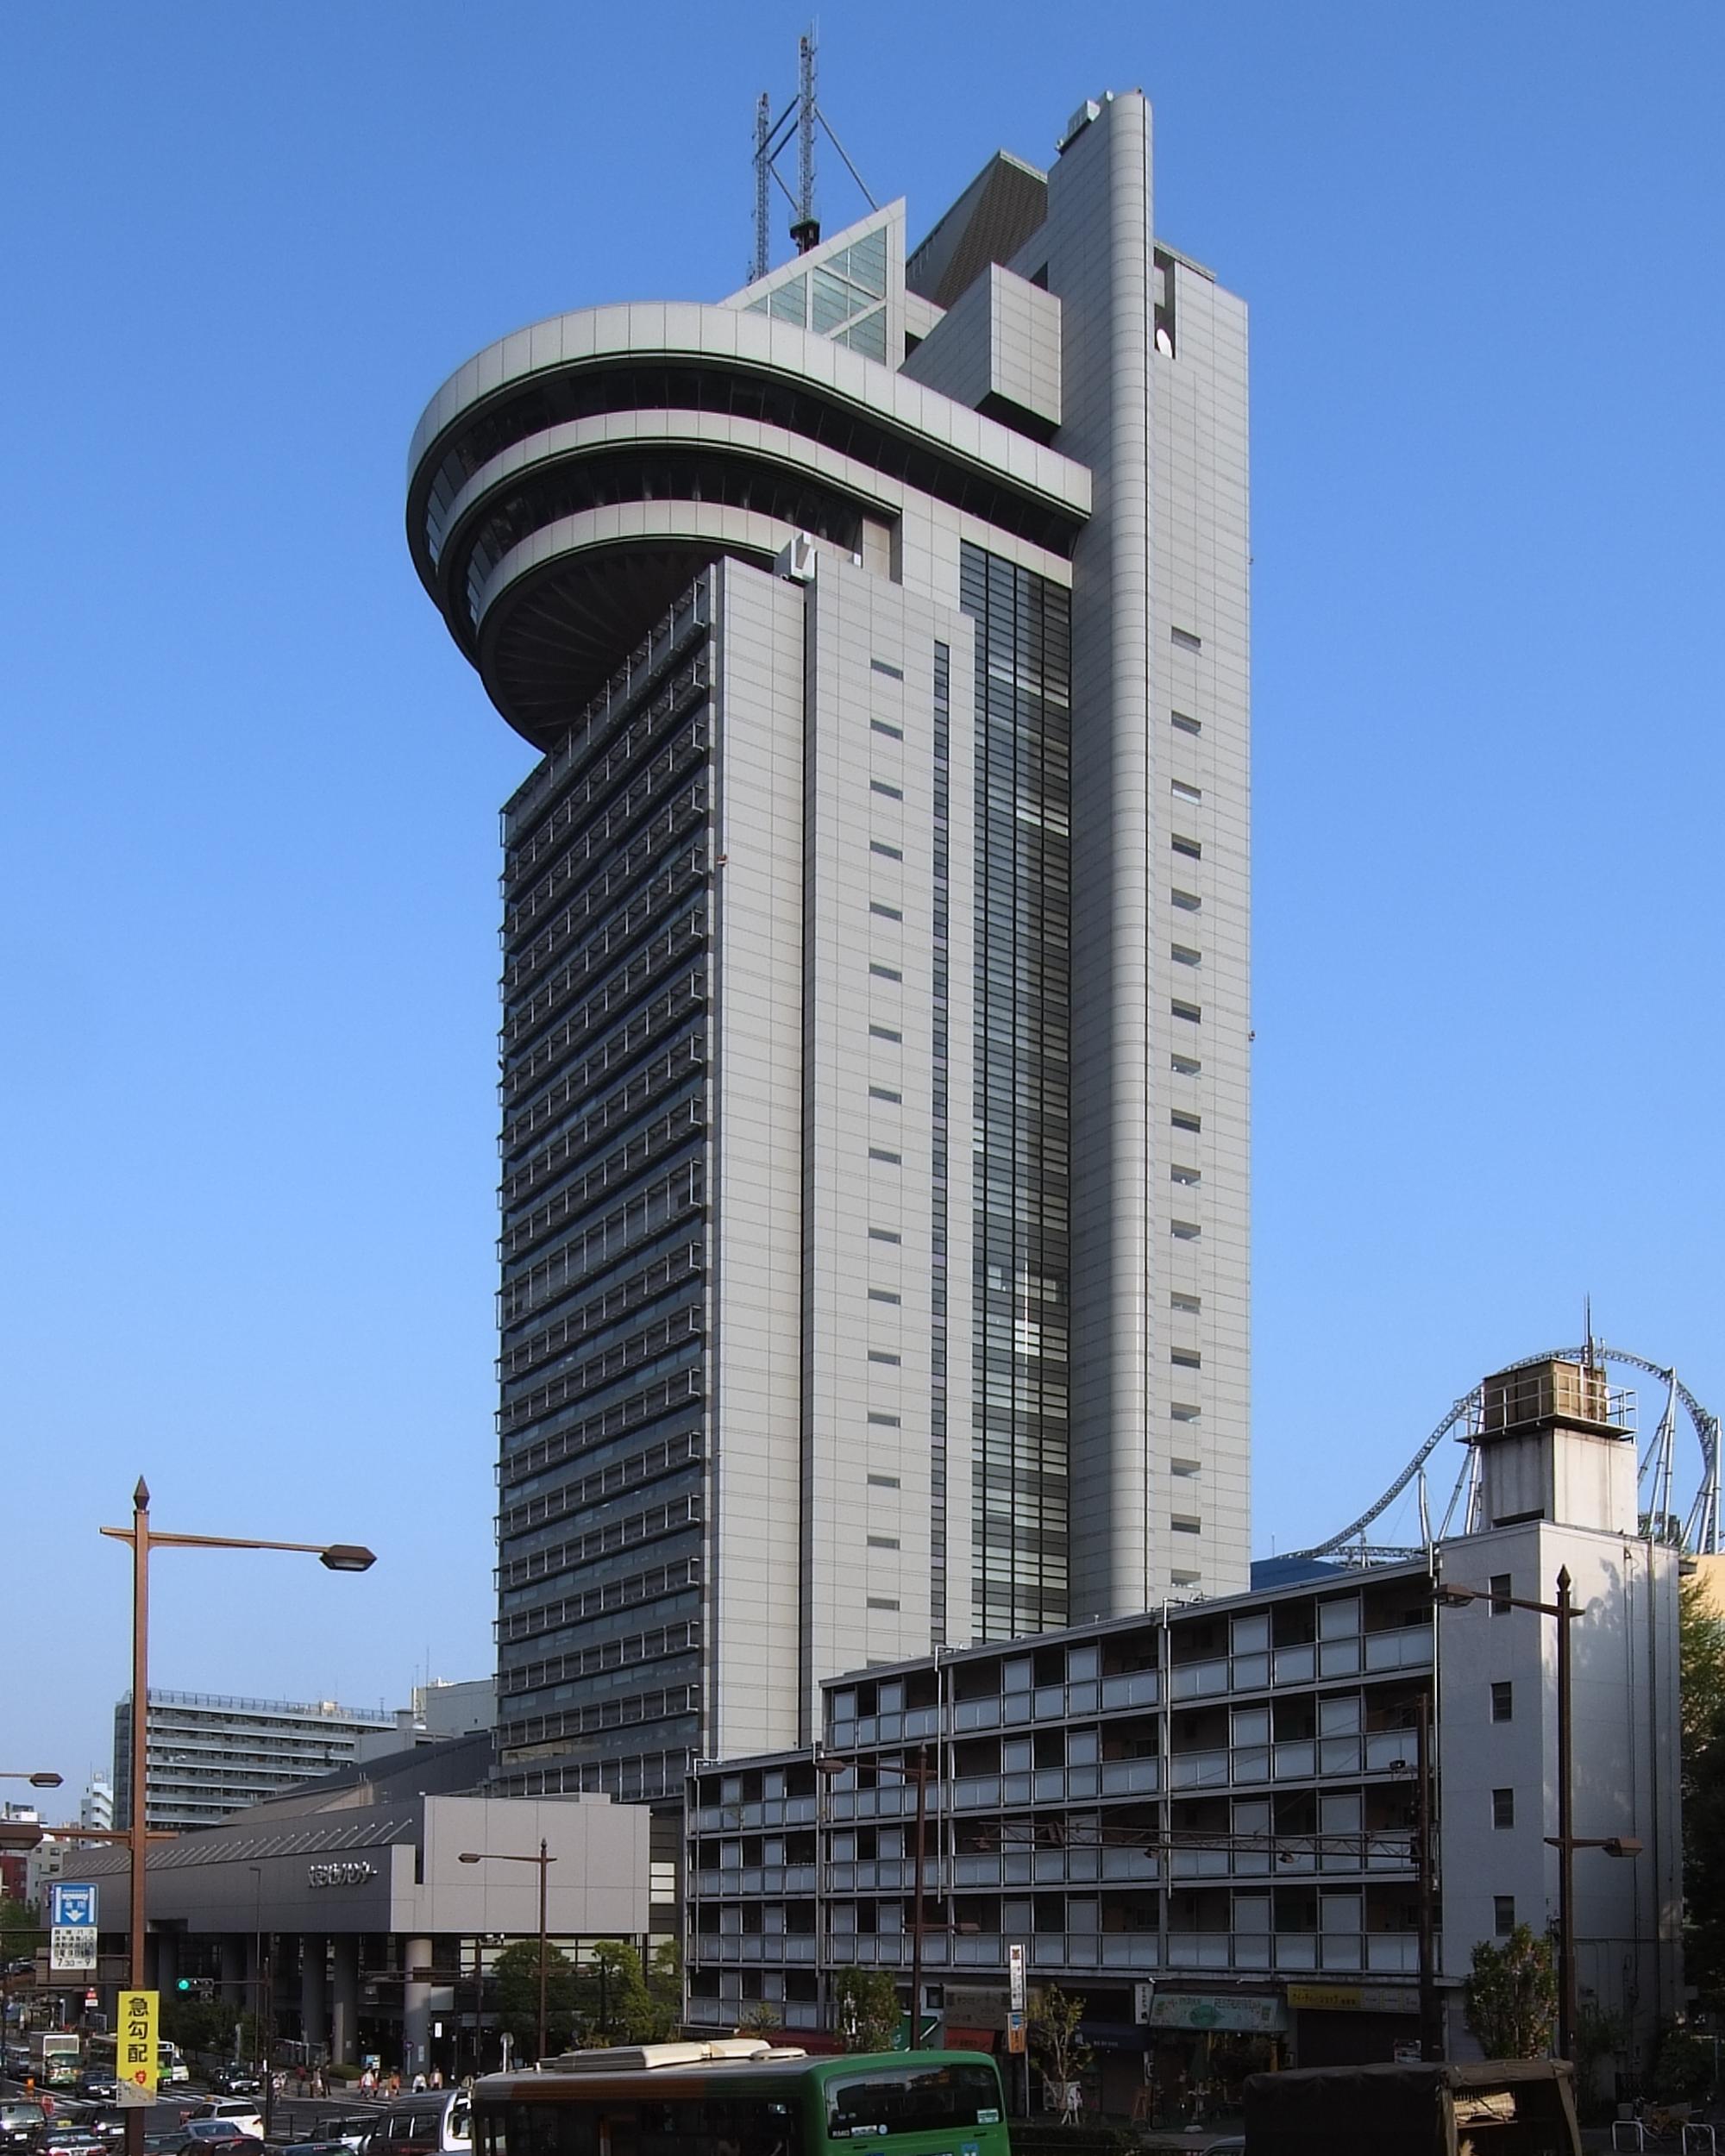 Civic Center Hotel